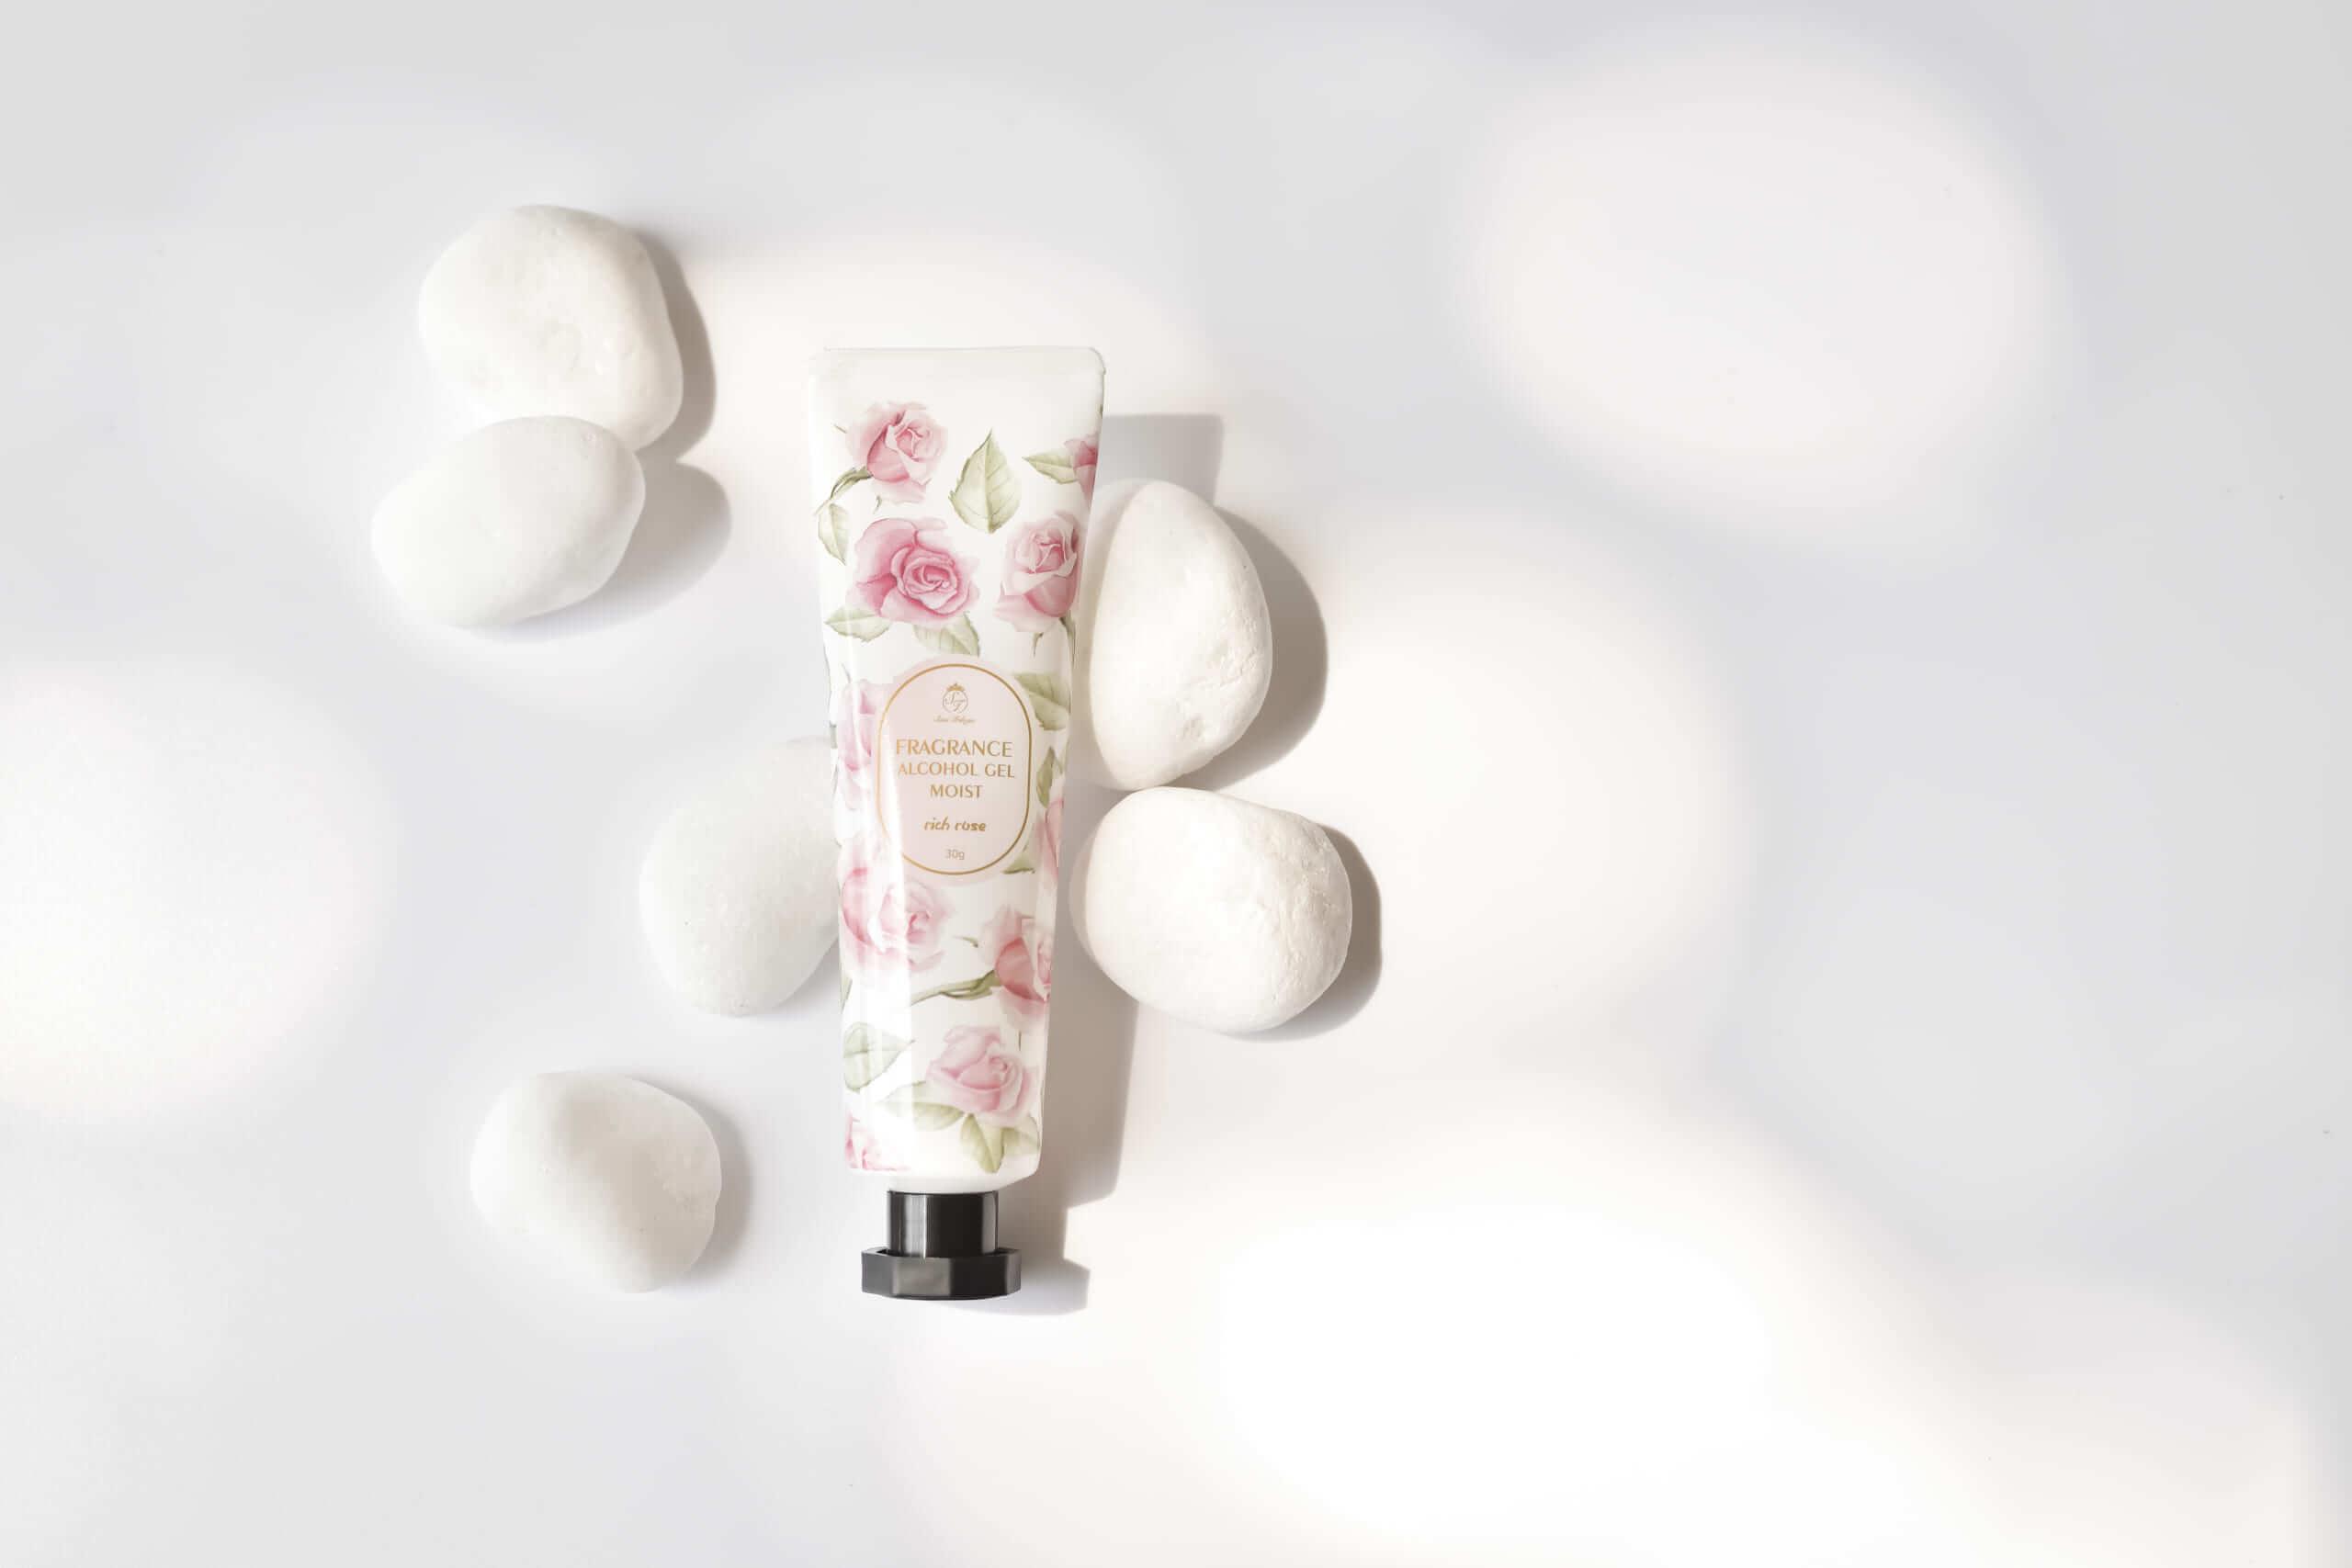 Sissi Trilogie fragrance alchol gel moist rich rose/¥480(税抜き)